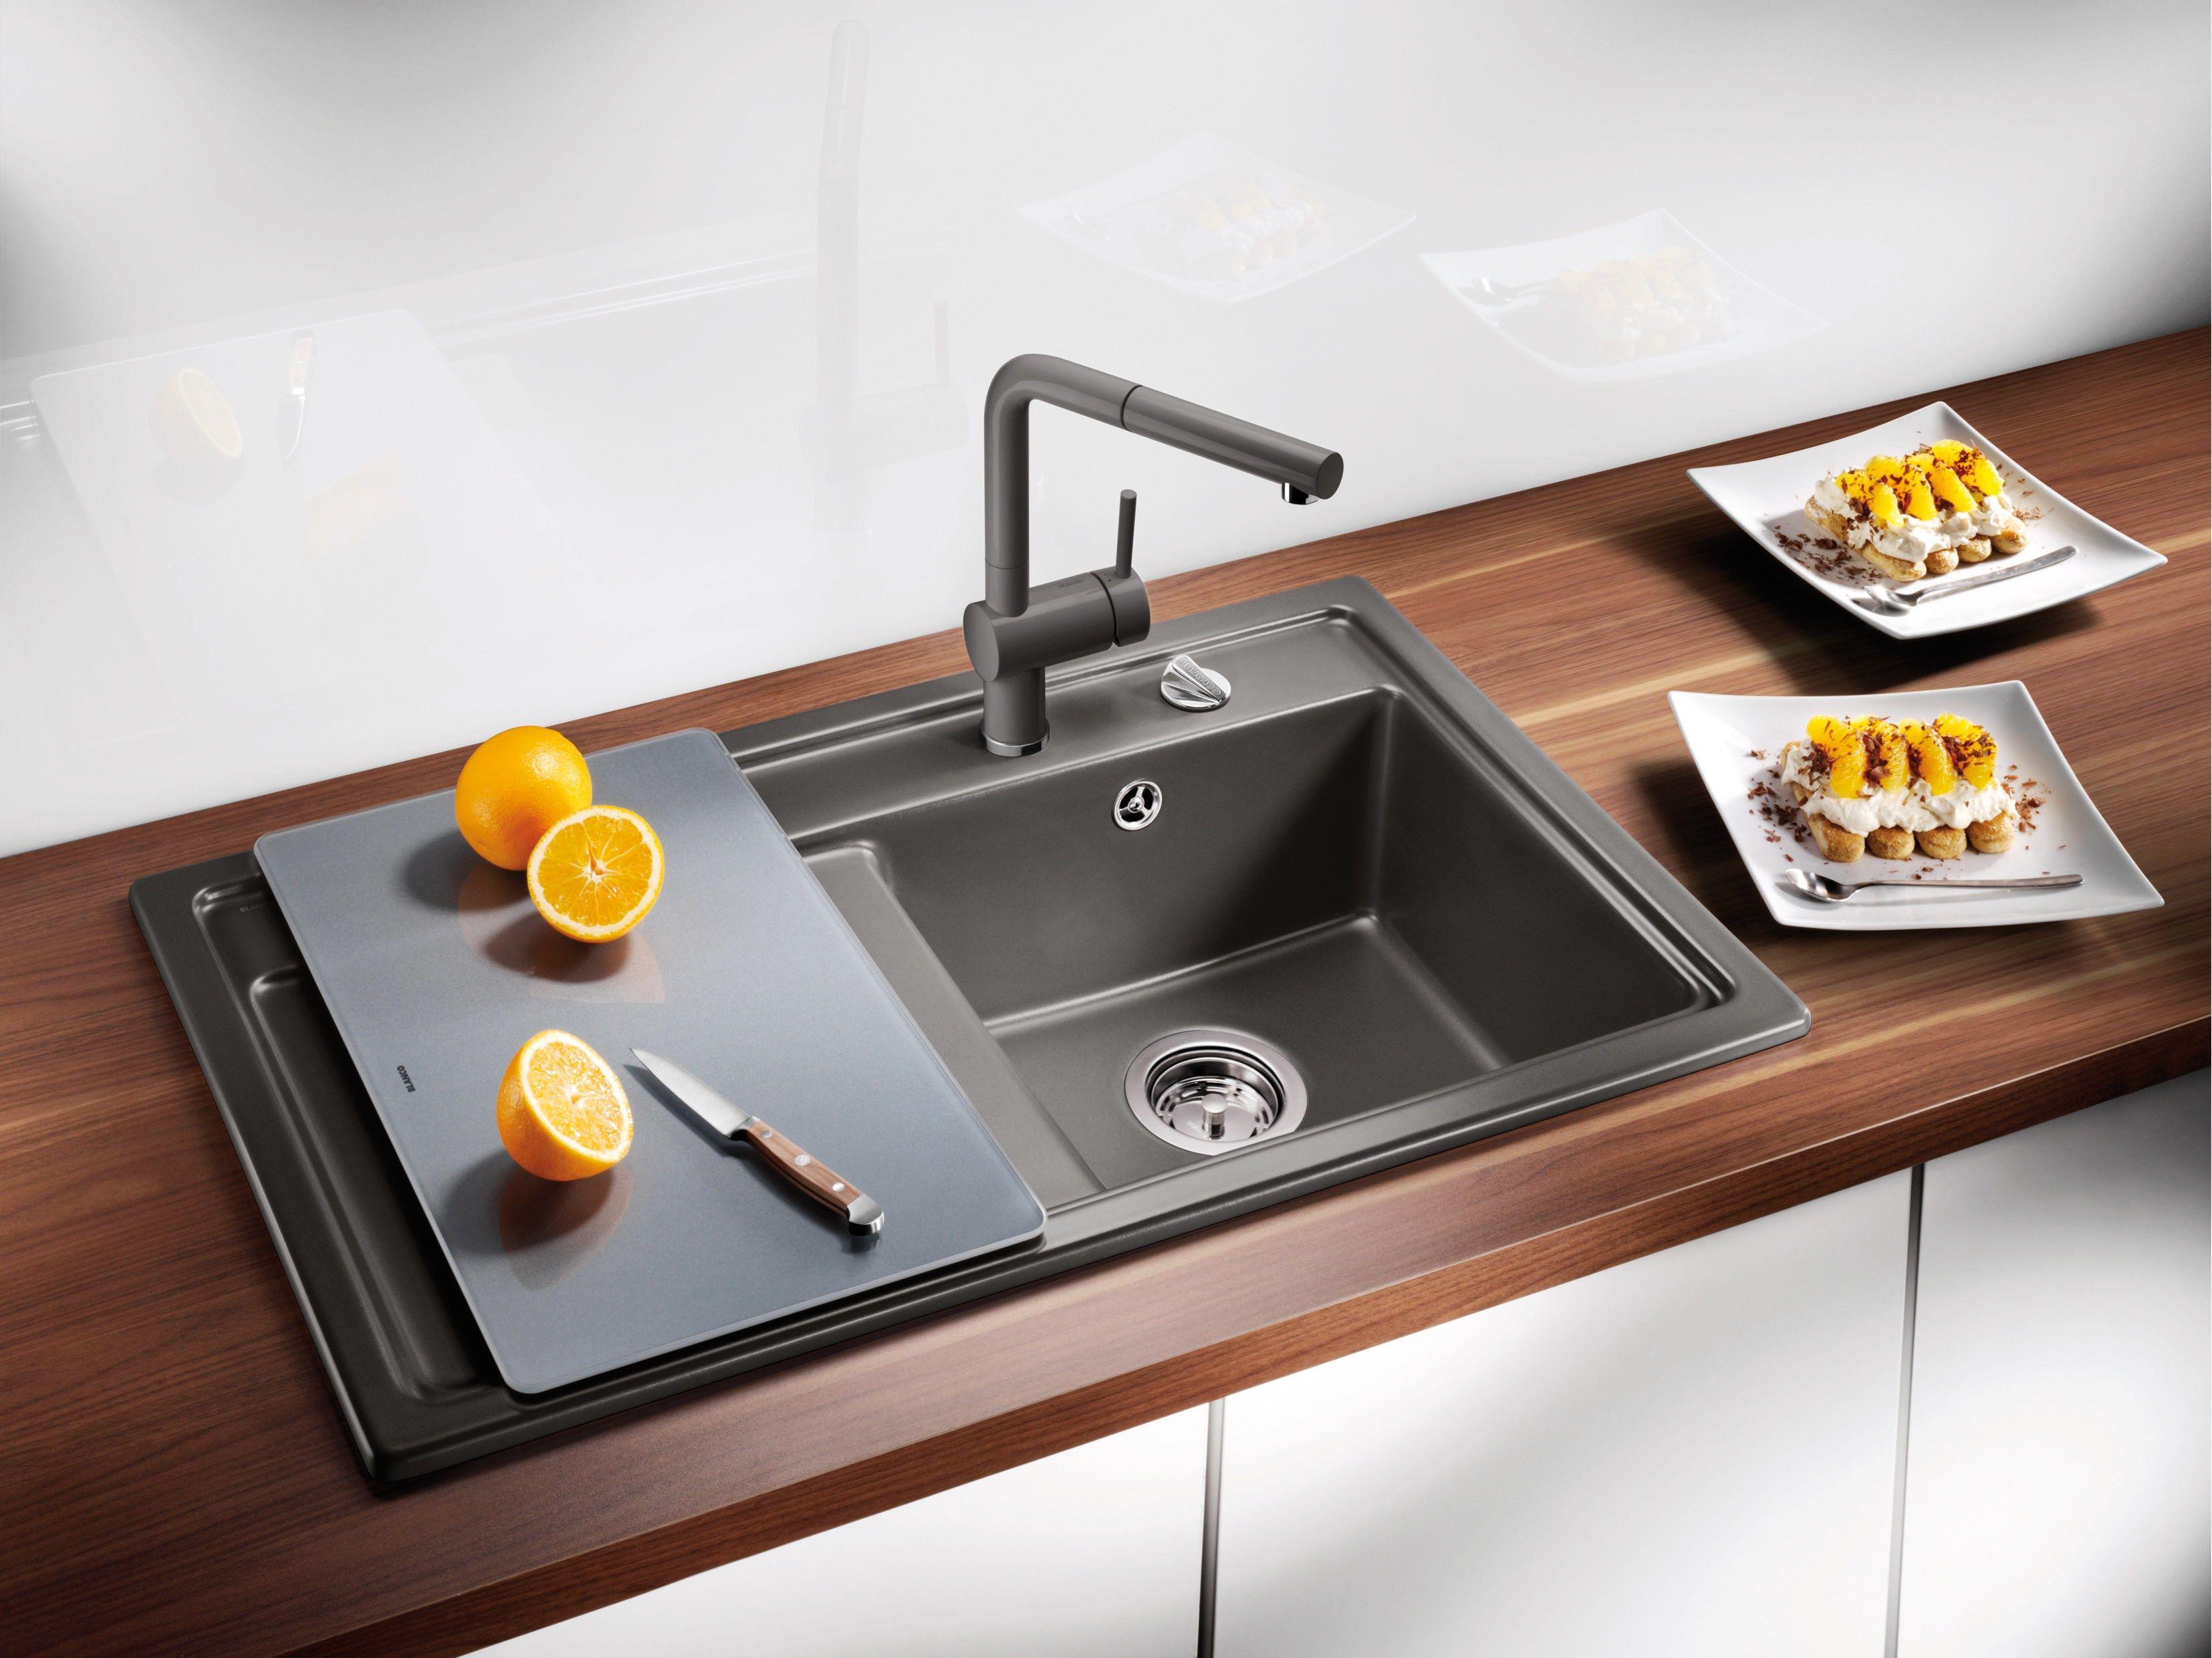 Best Picture Floor And Decor Kitchen Sinks